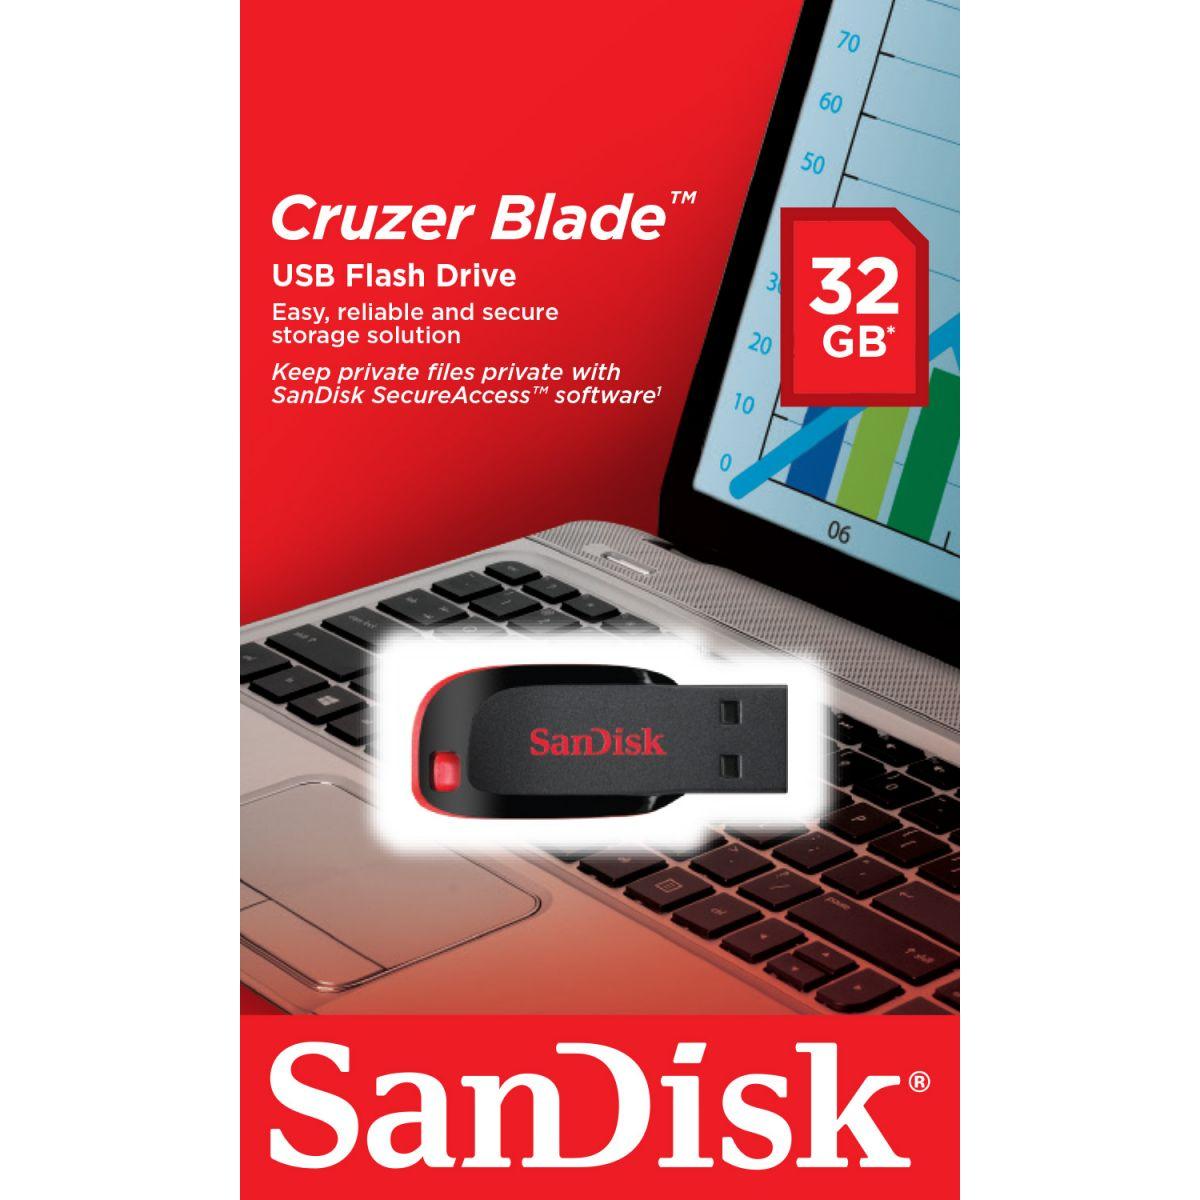 Pen Drive 32GB Cruzer Blade Preto/Vermelho SDCZ50-032G-B35 - Sandisk